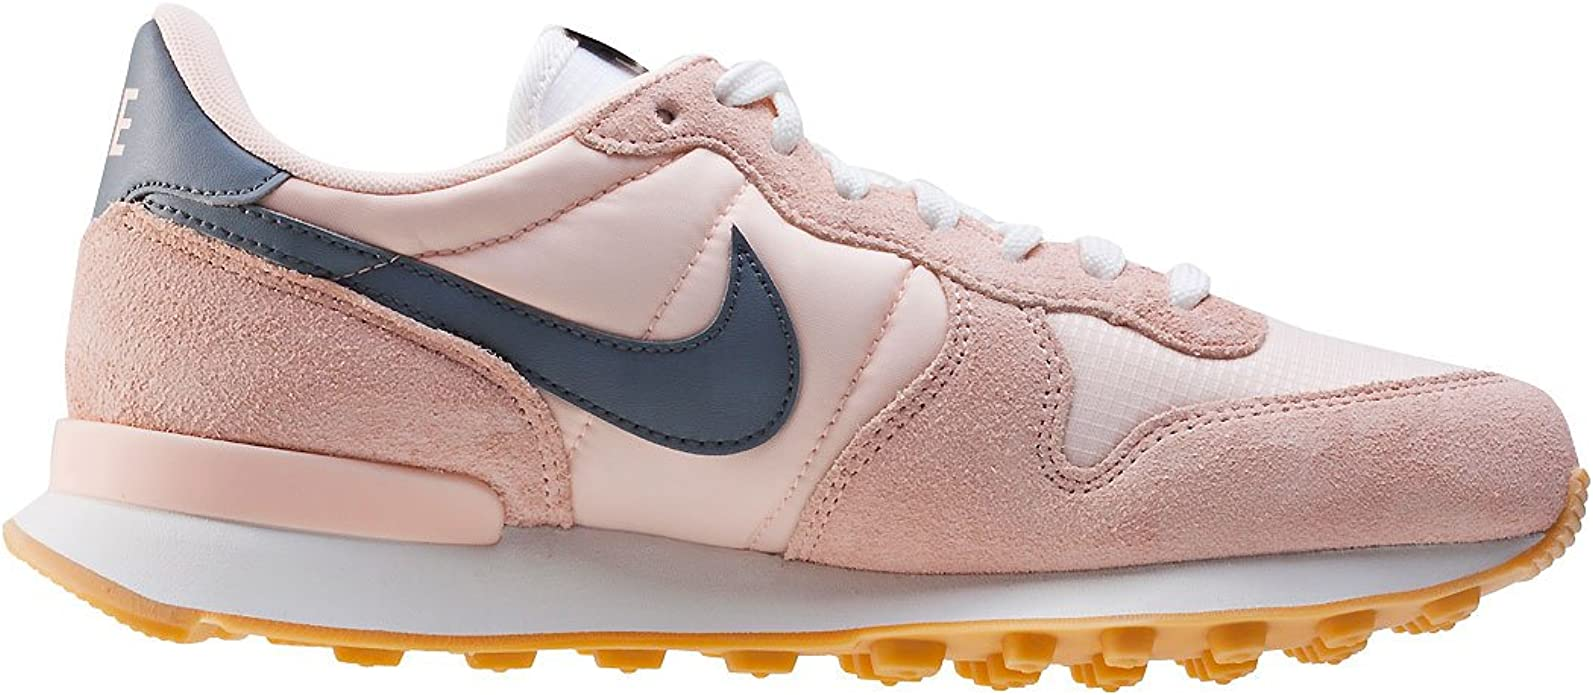 Amazon.com: Nike Women's WMNS Internationalist Trainers ...